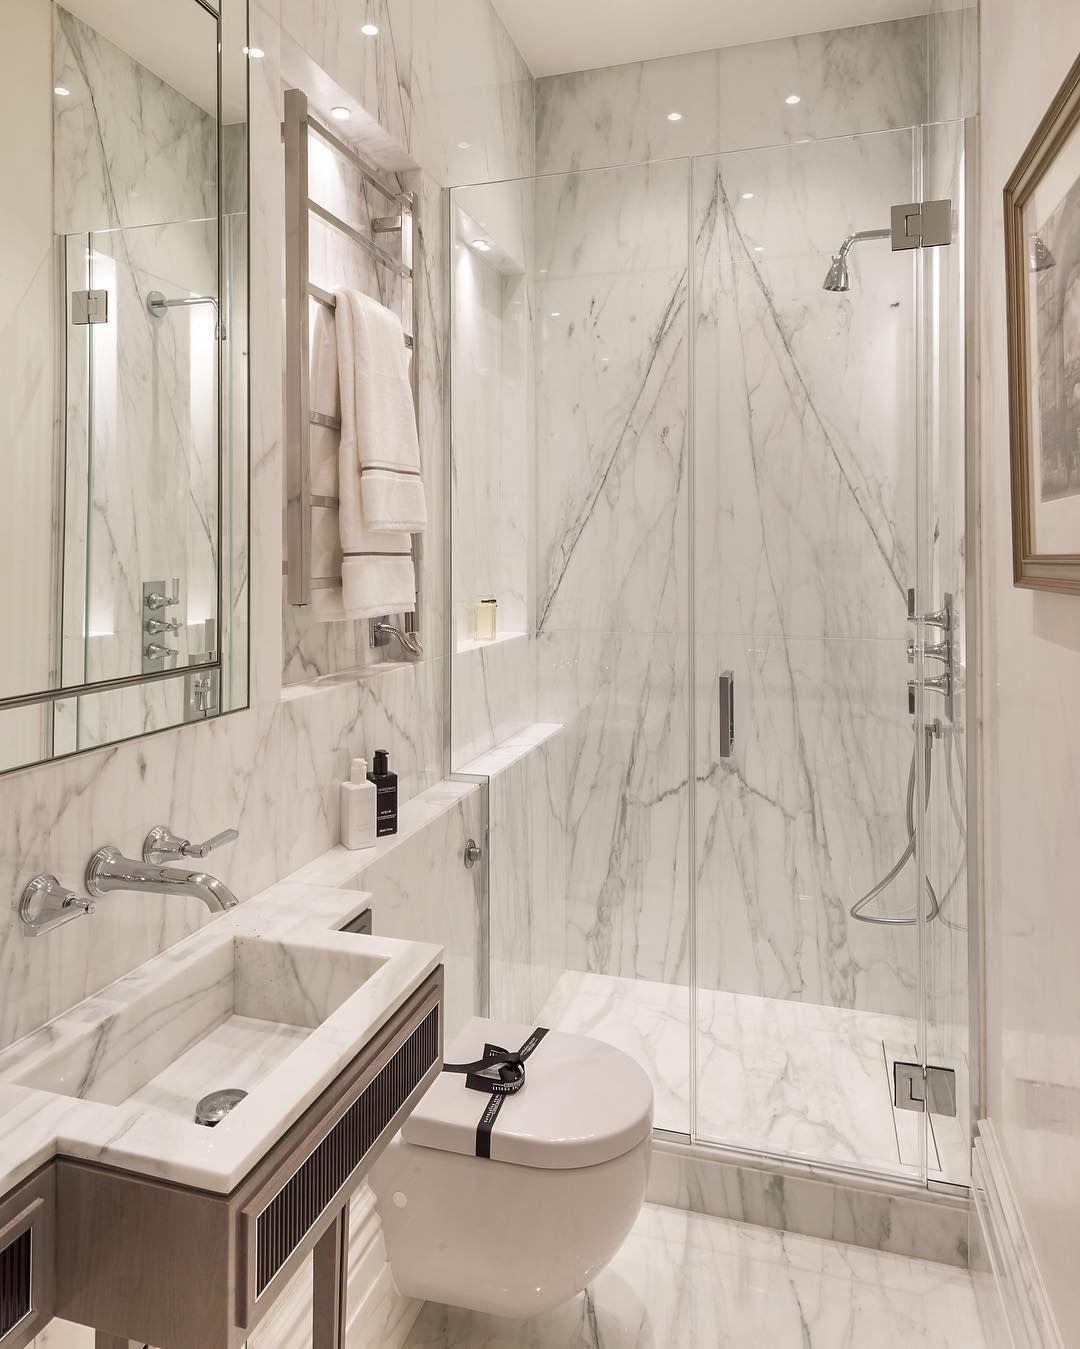 Banheiro Pequeno, Banheiros Pequenos Modernos